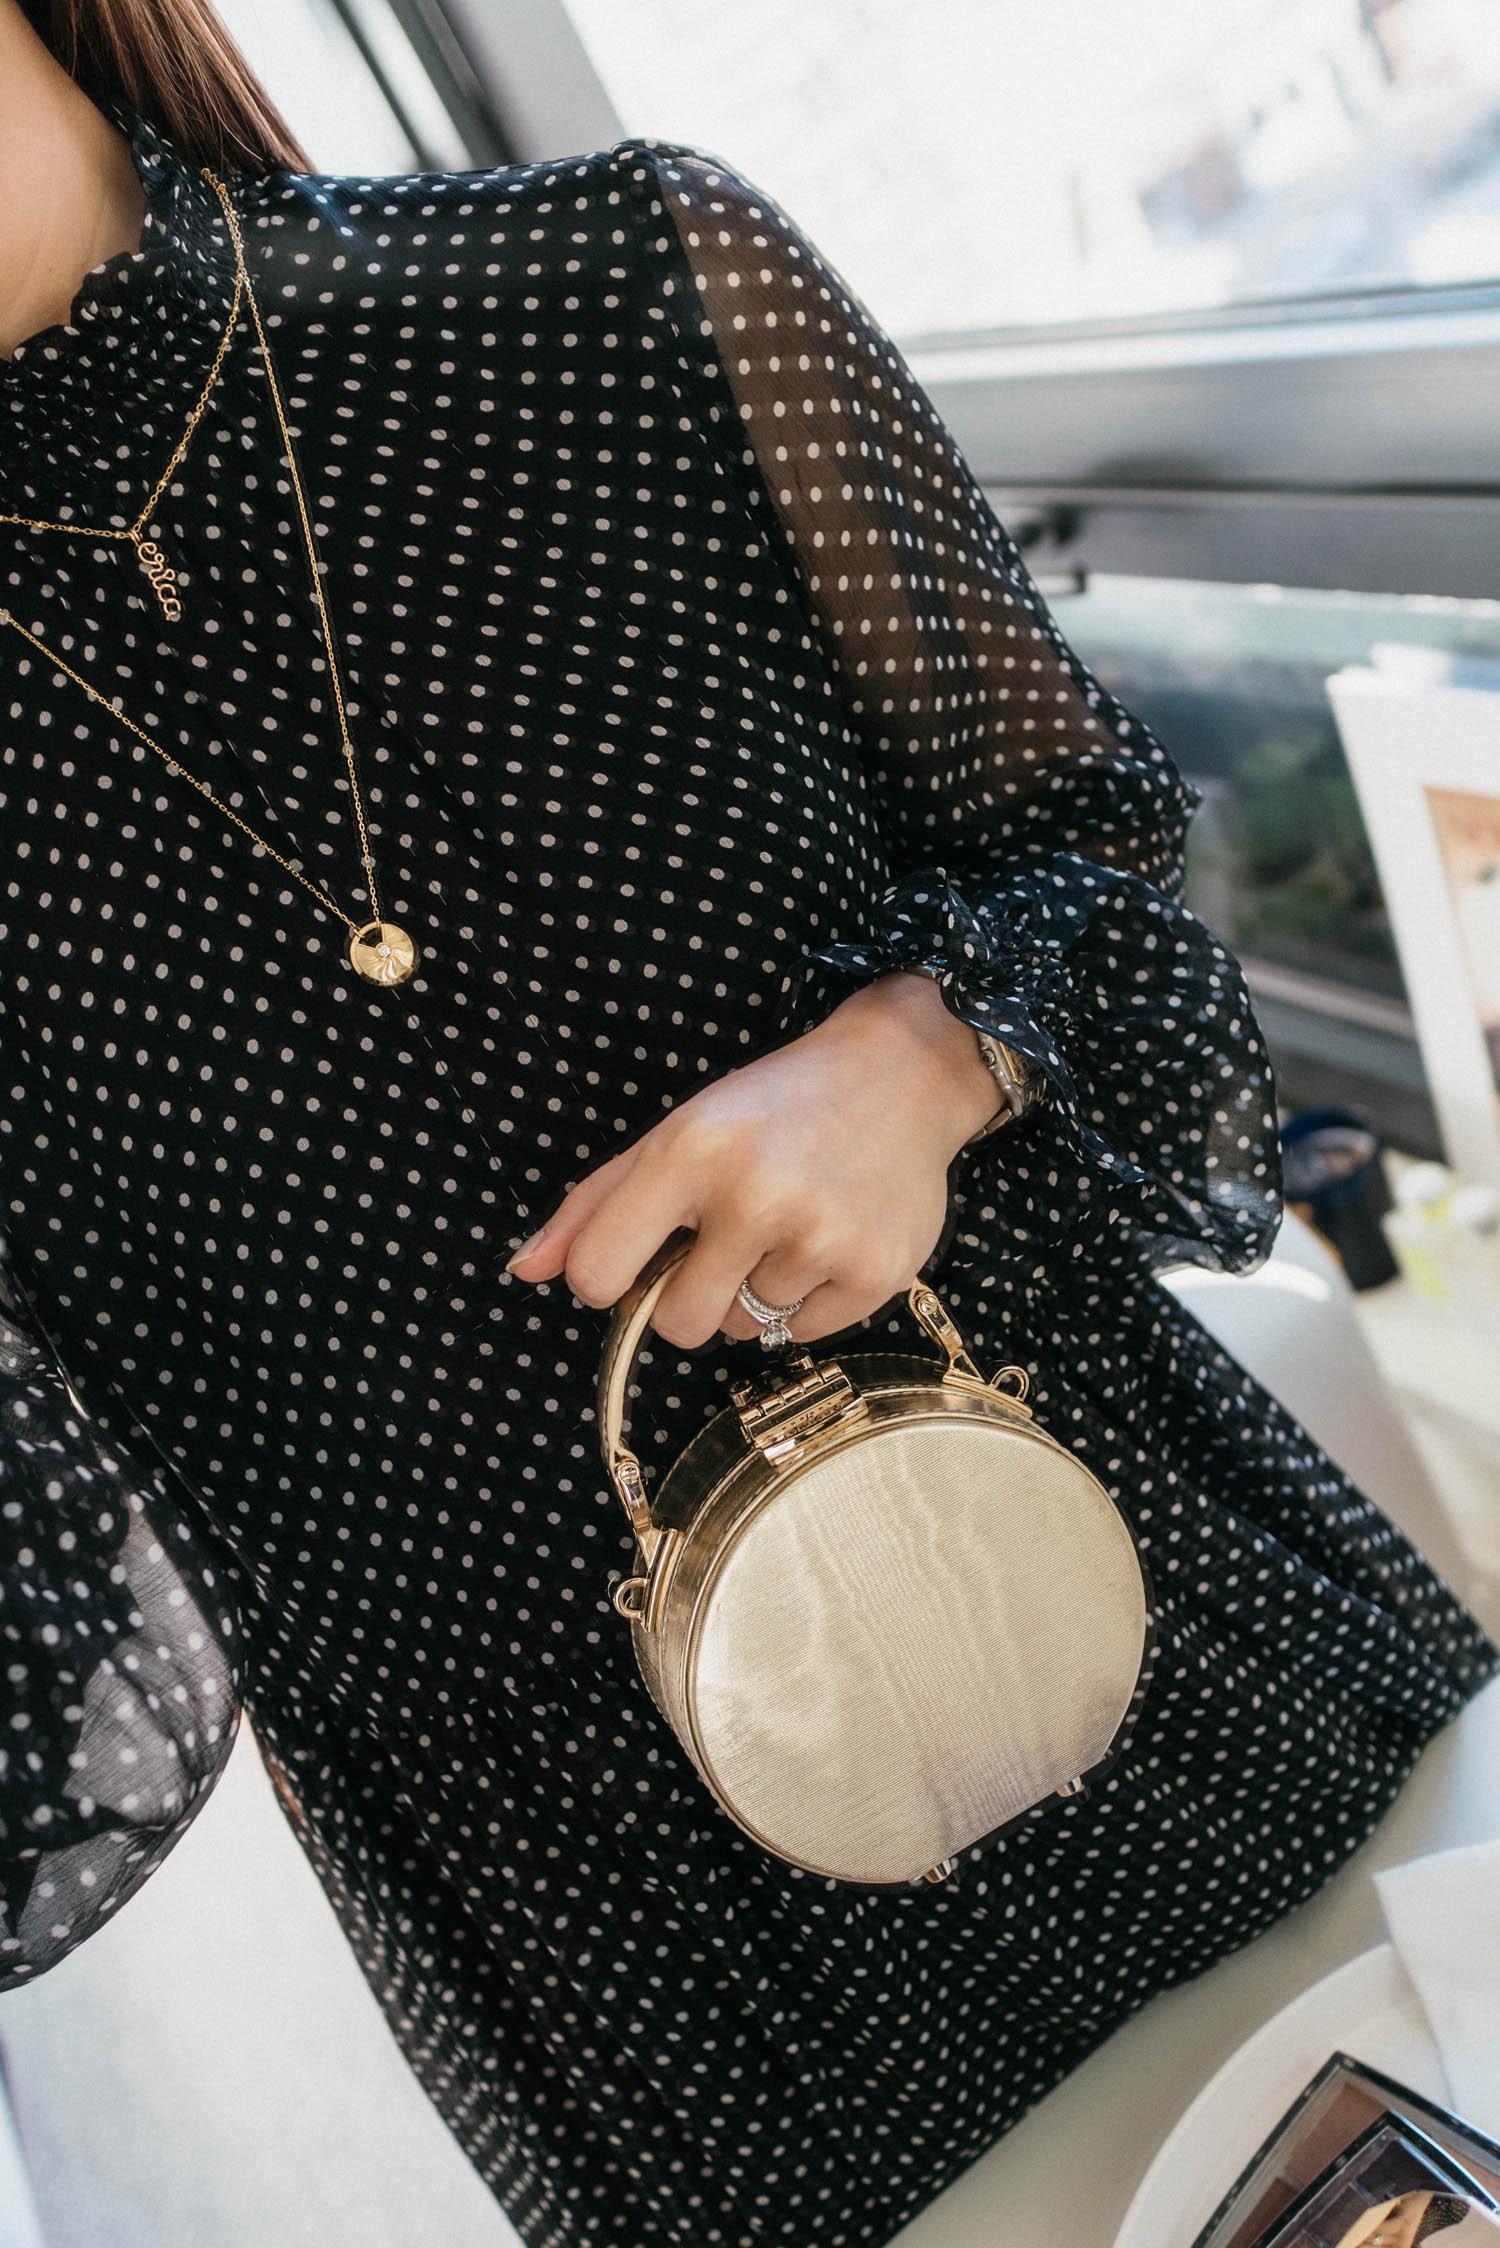 Sézane Dress ,  Aspinal of London Bag ,  Cartier Necklace ,  Atelier Paulin Necklace